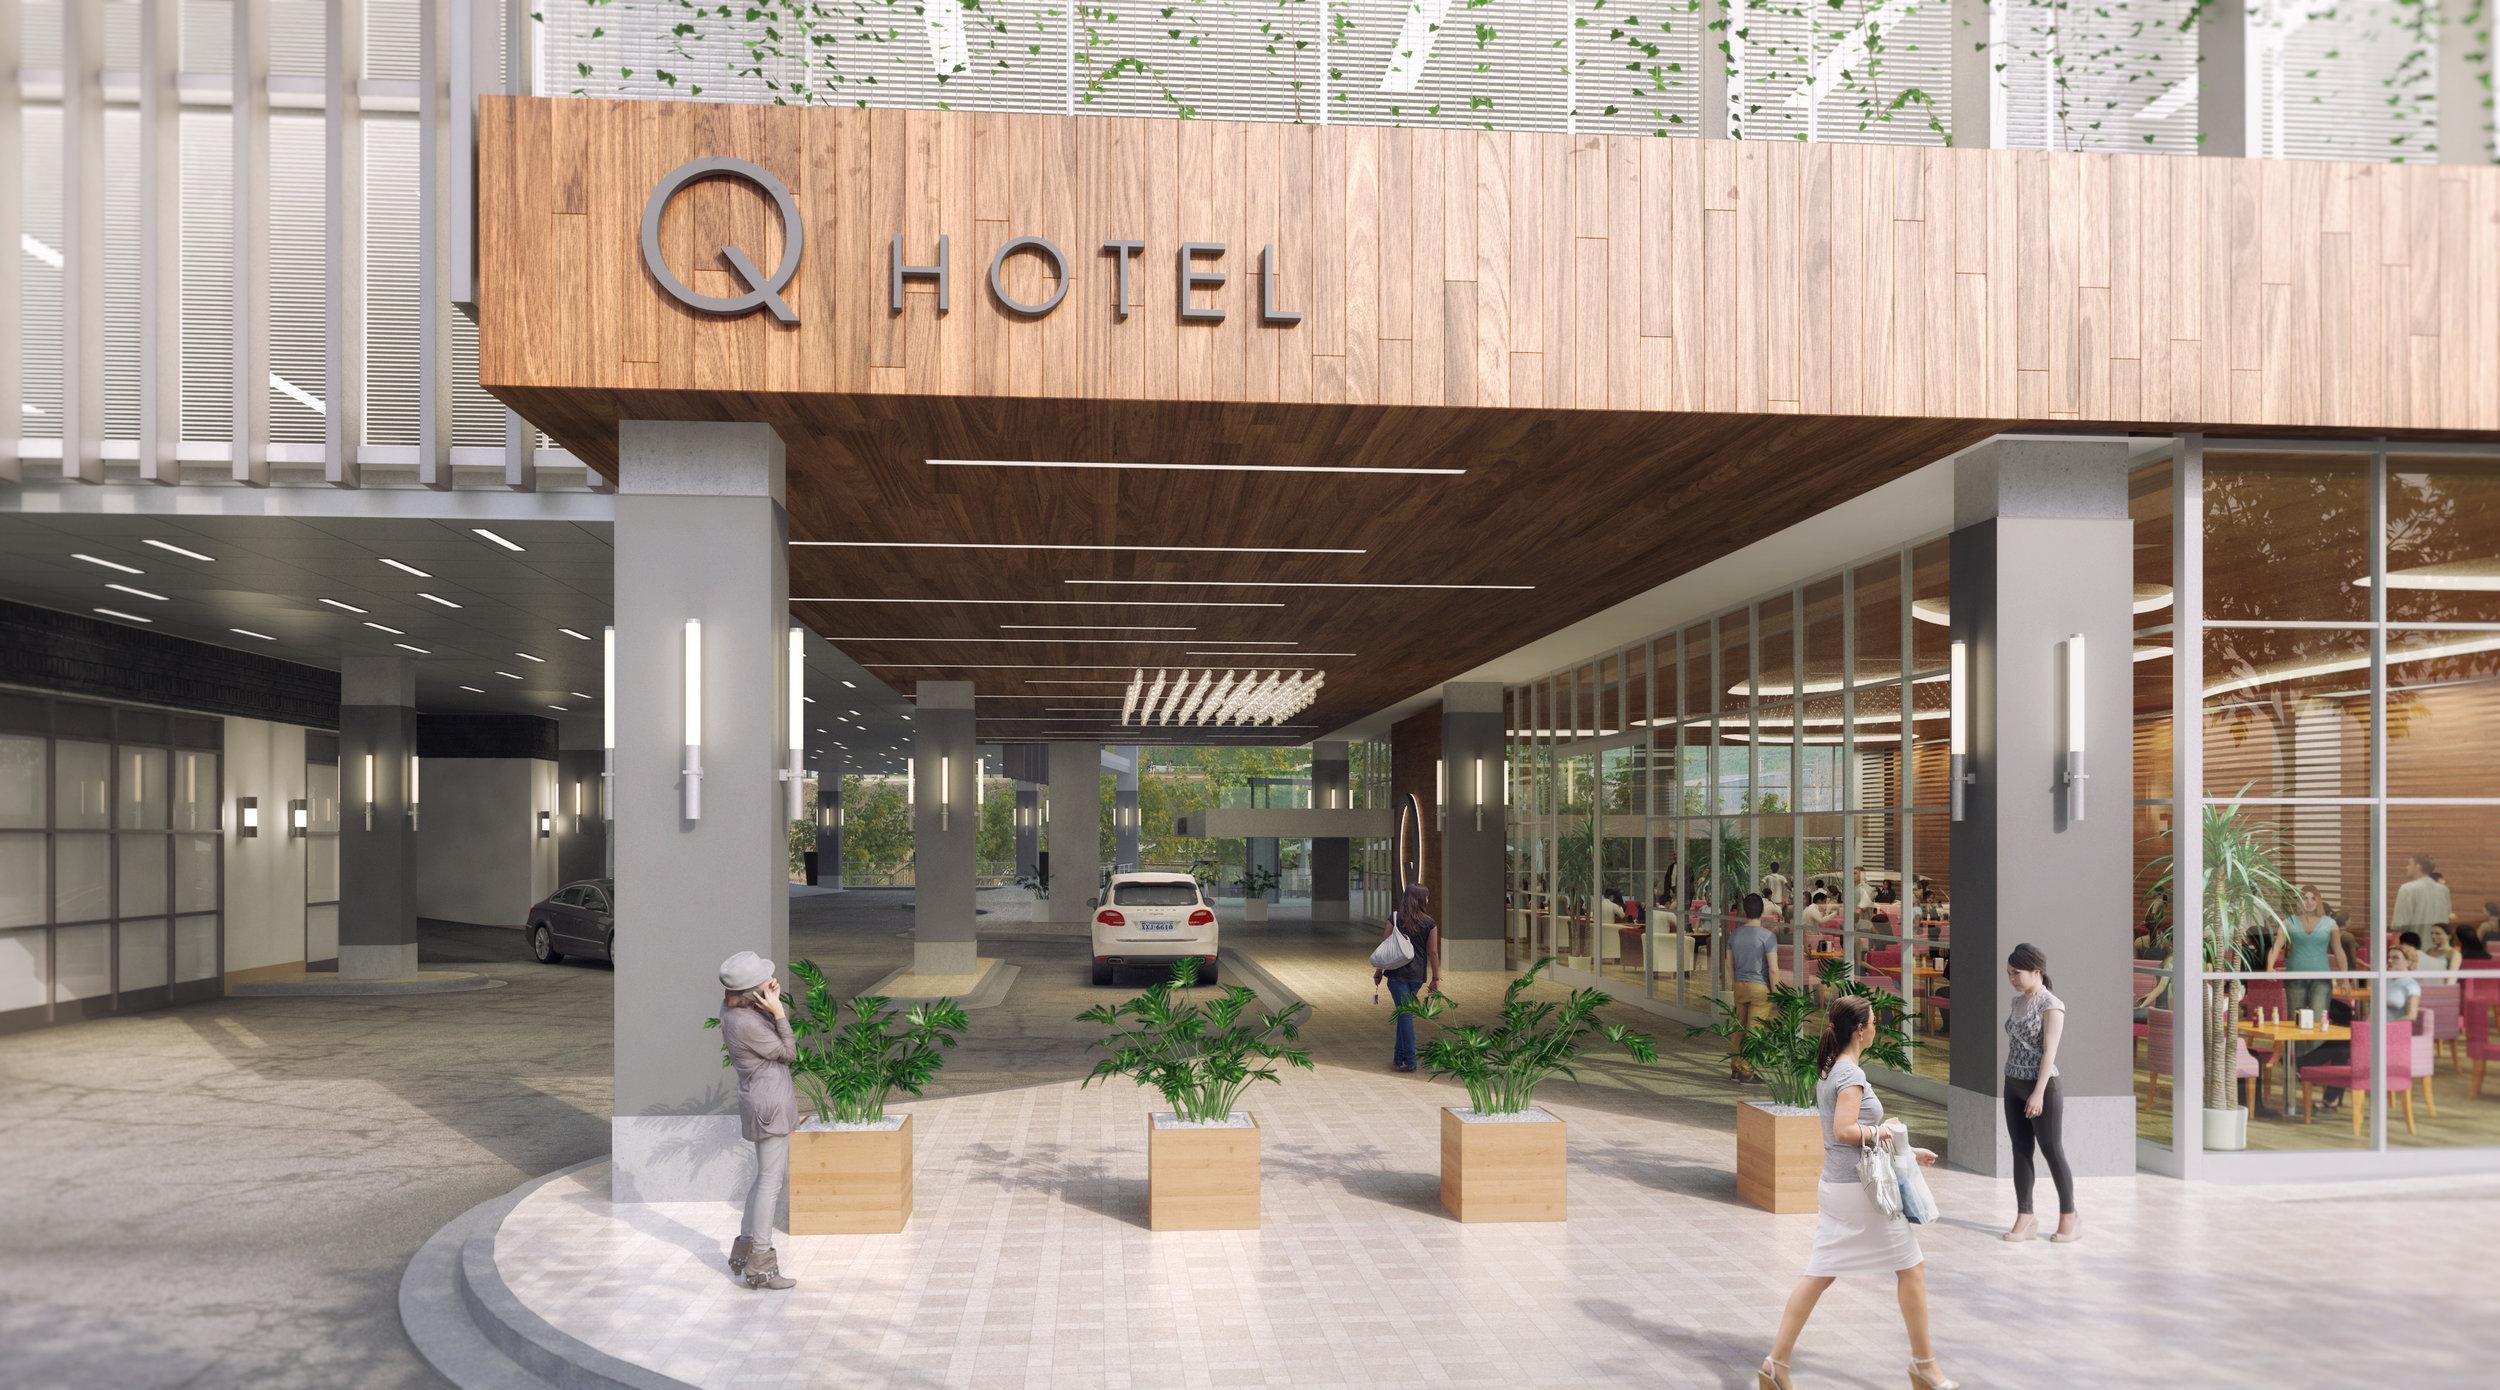 Q-Hotel_View-03.jpg